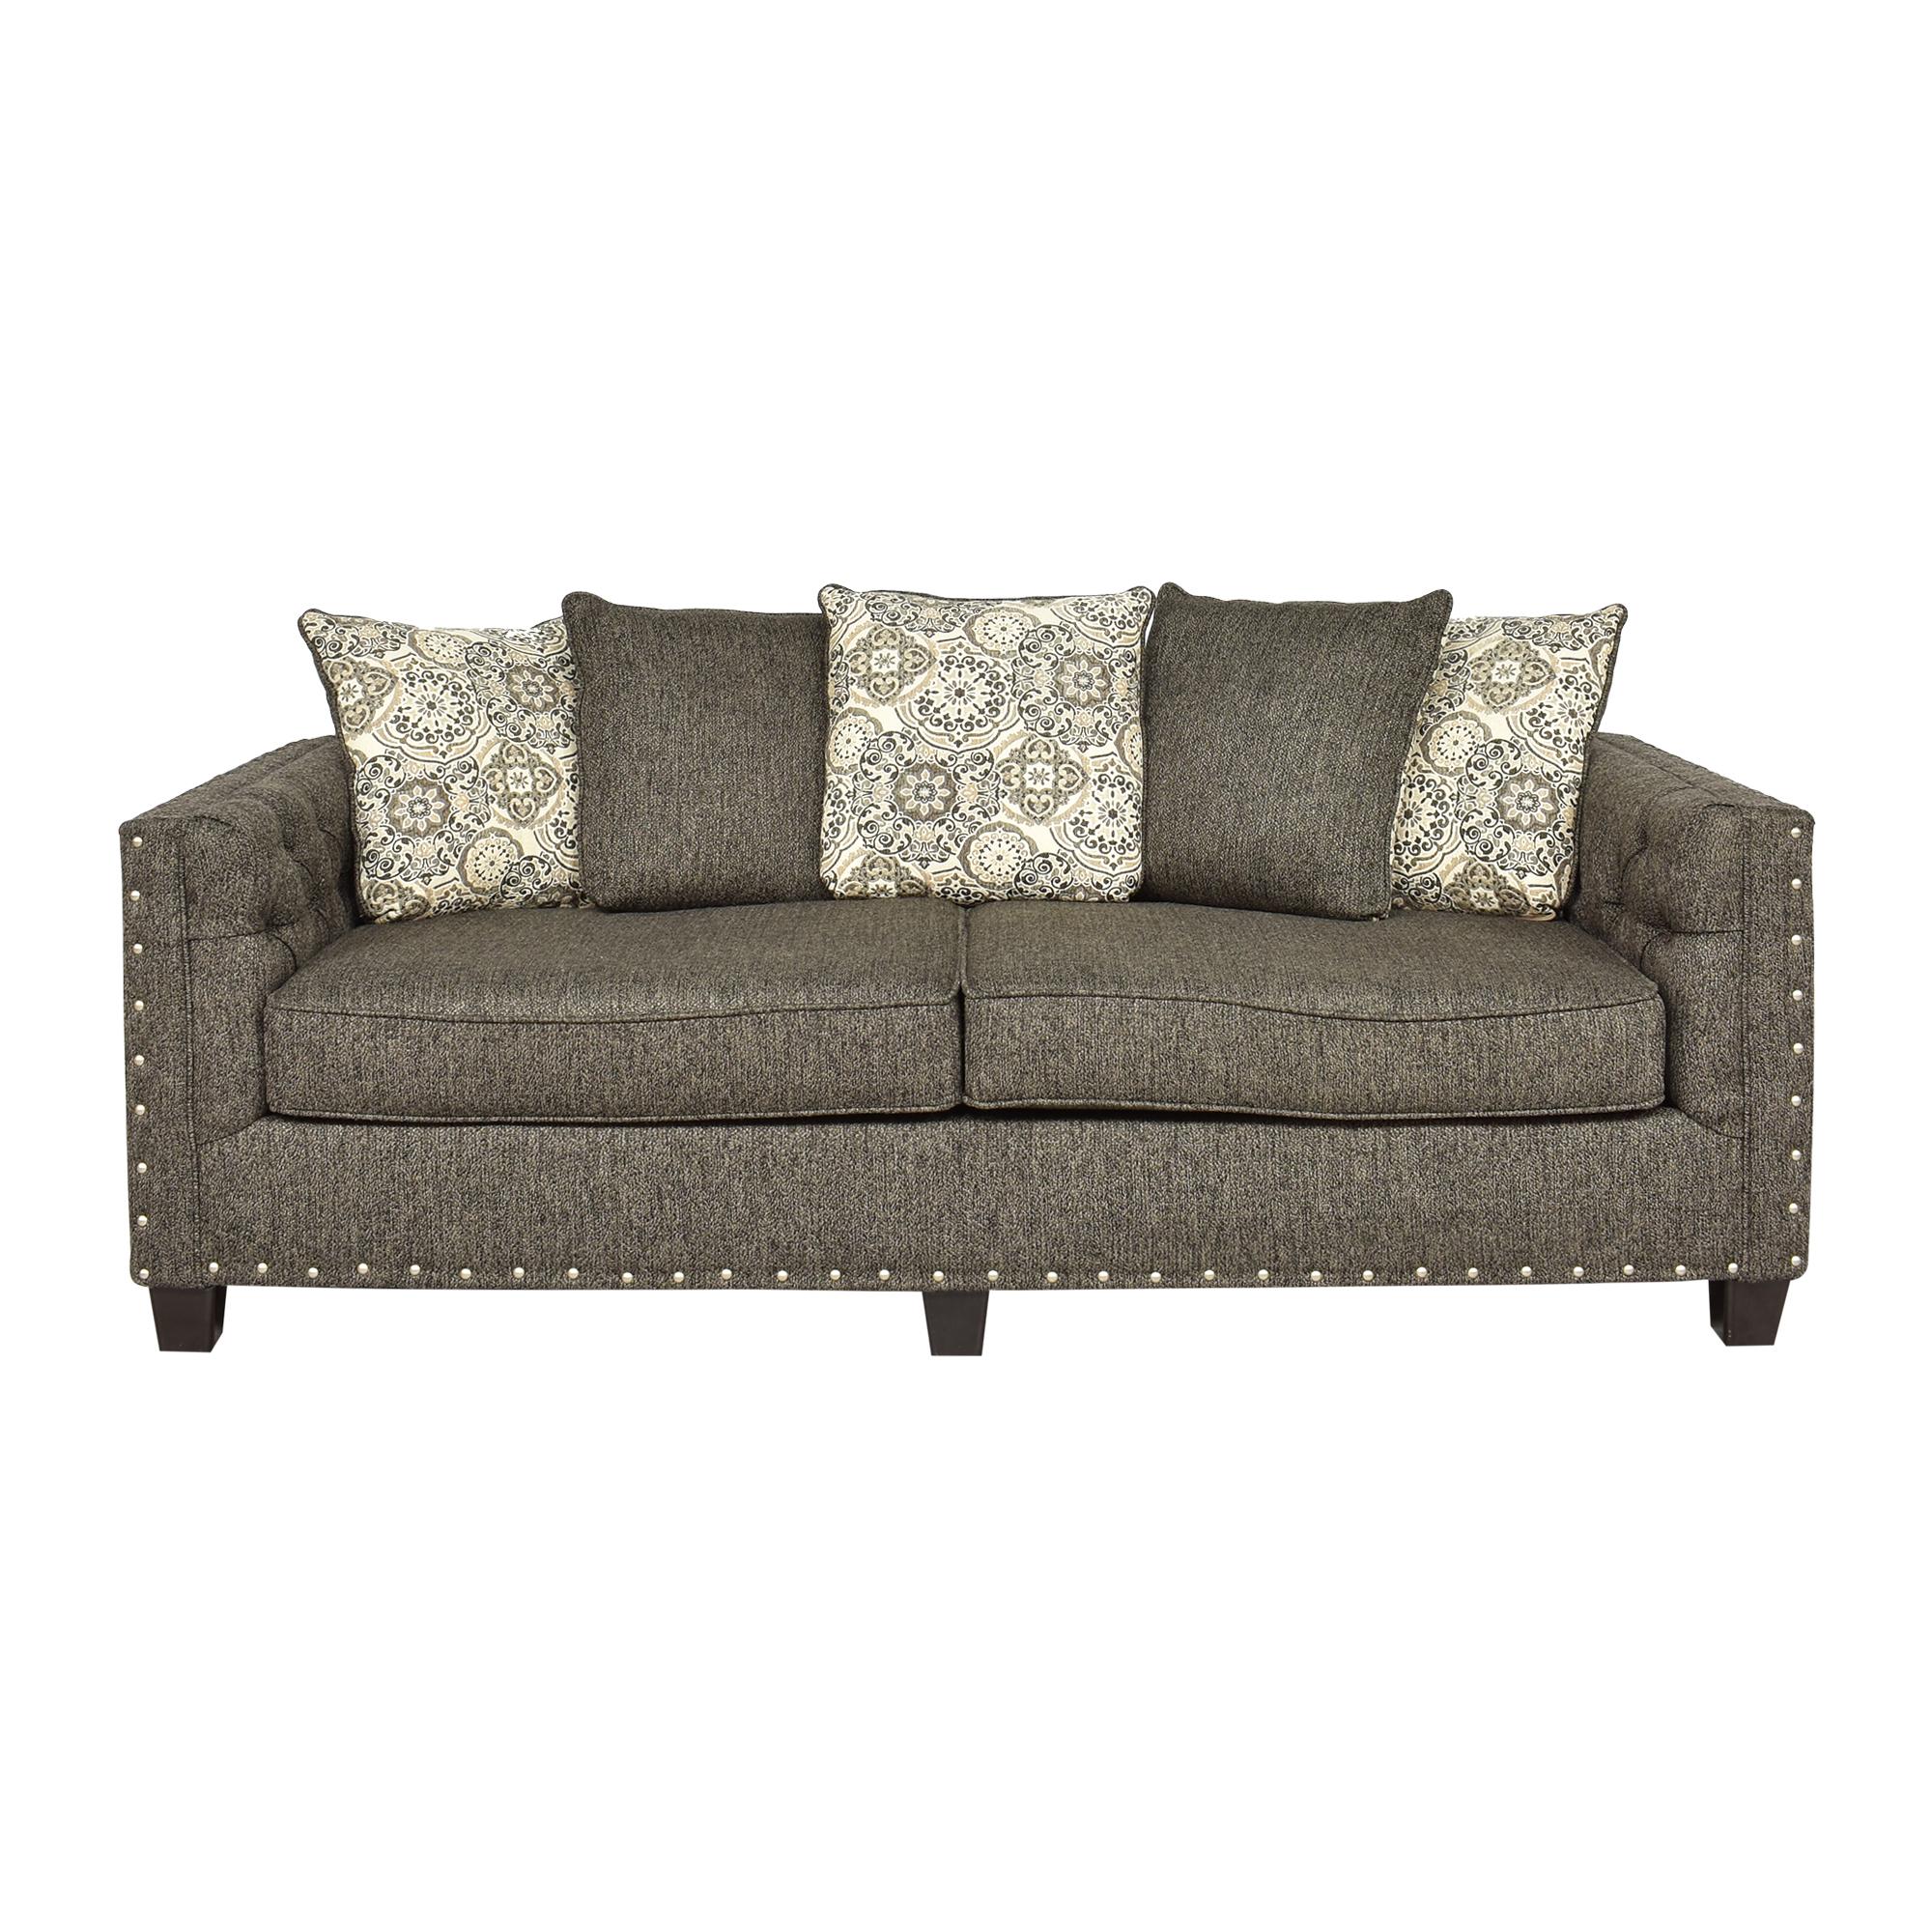 Hughes Furniture Hughes Furniture Nailhead Sofa pa